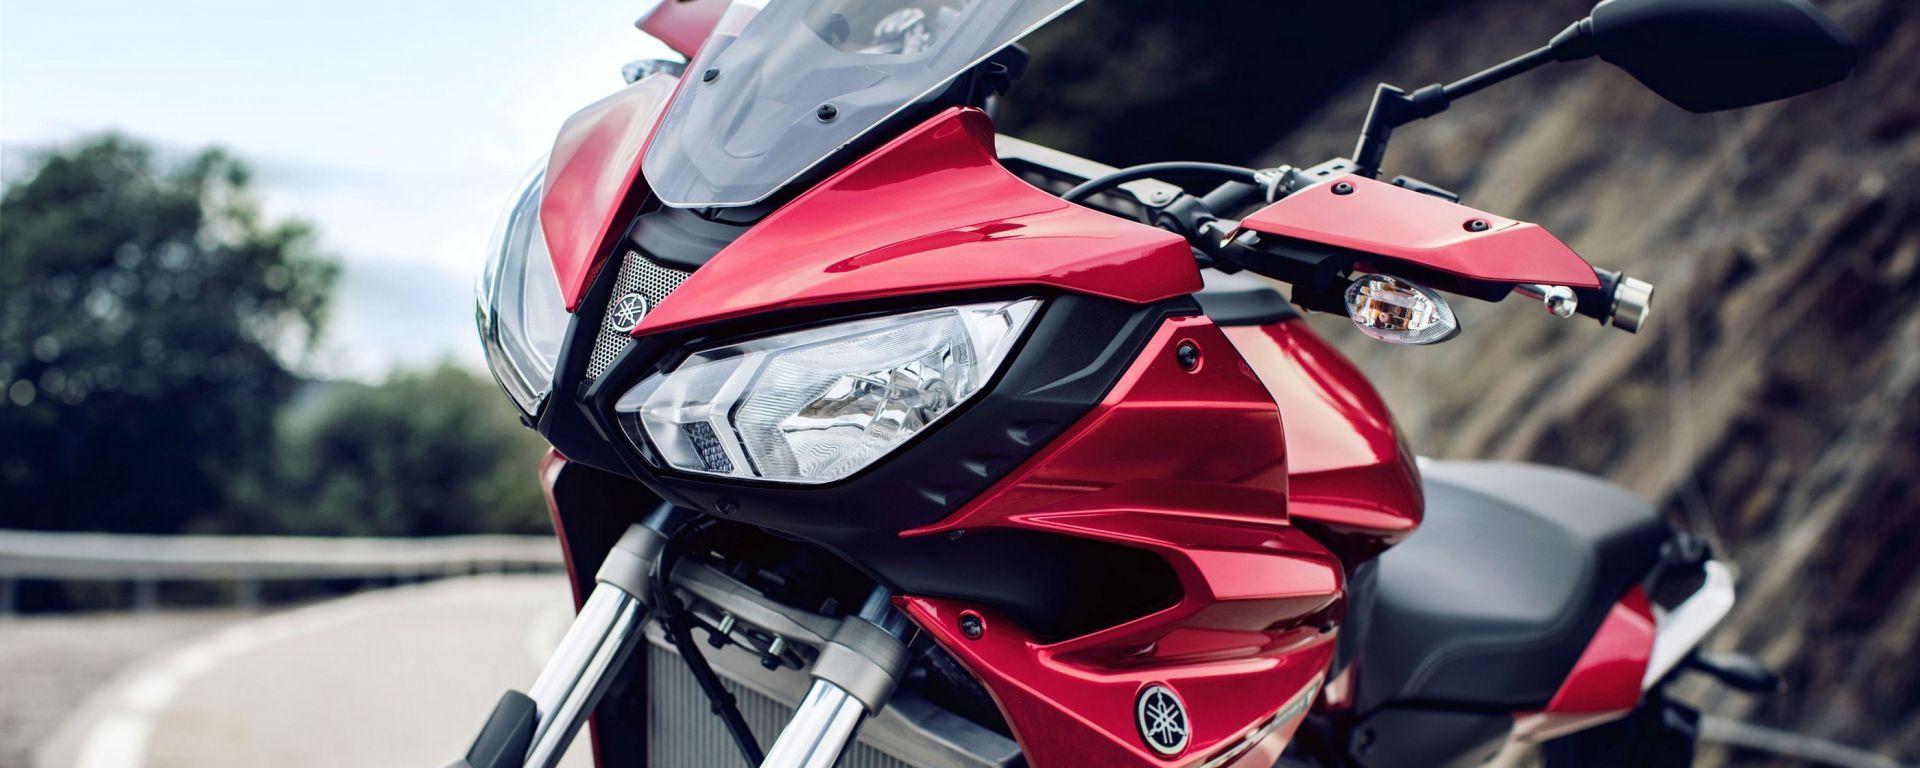 Yamaha Tracer 700: foto e video